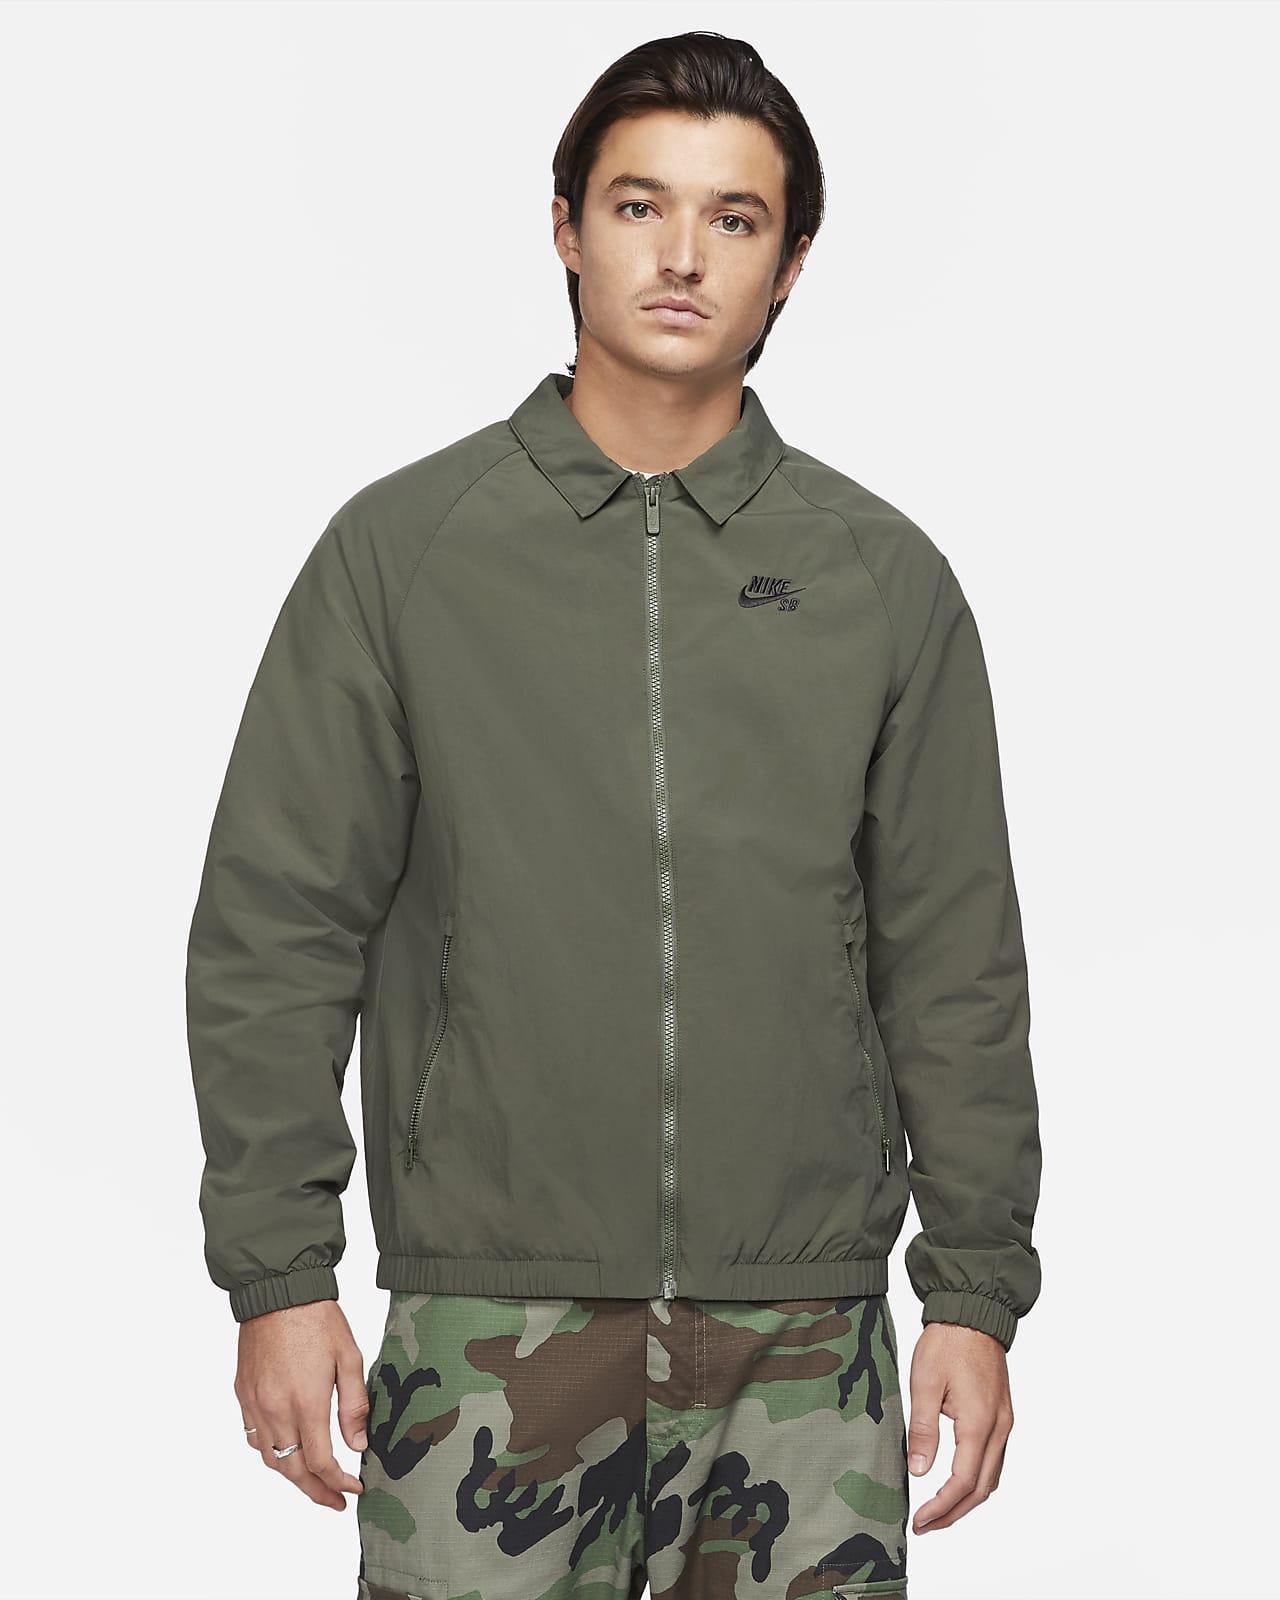 Nike SB Skate Jacket